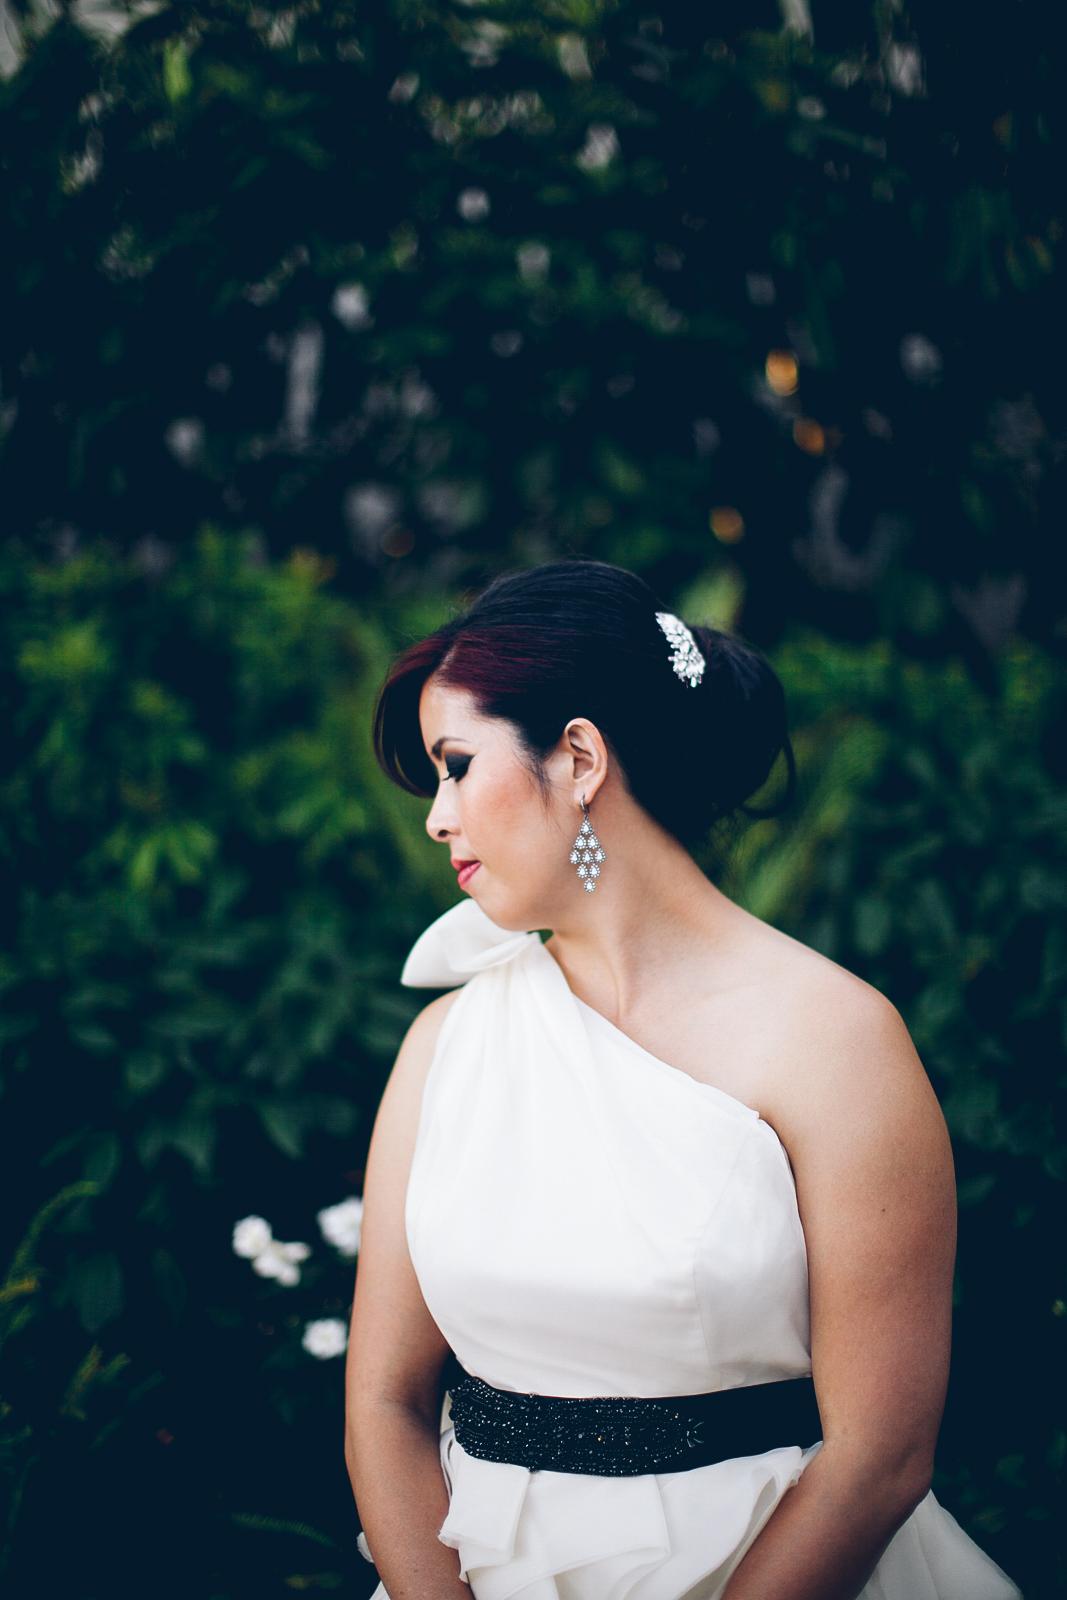 greens_restaurant_wedding_photography_san_franscisco_ebony_siovhan_bokeh_photography_29.jpg